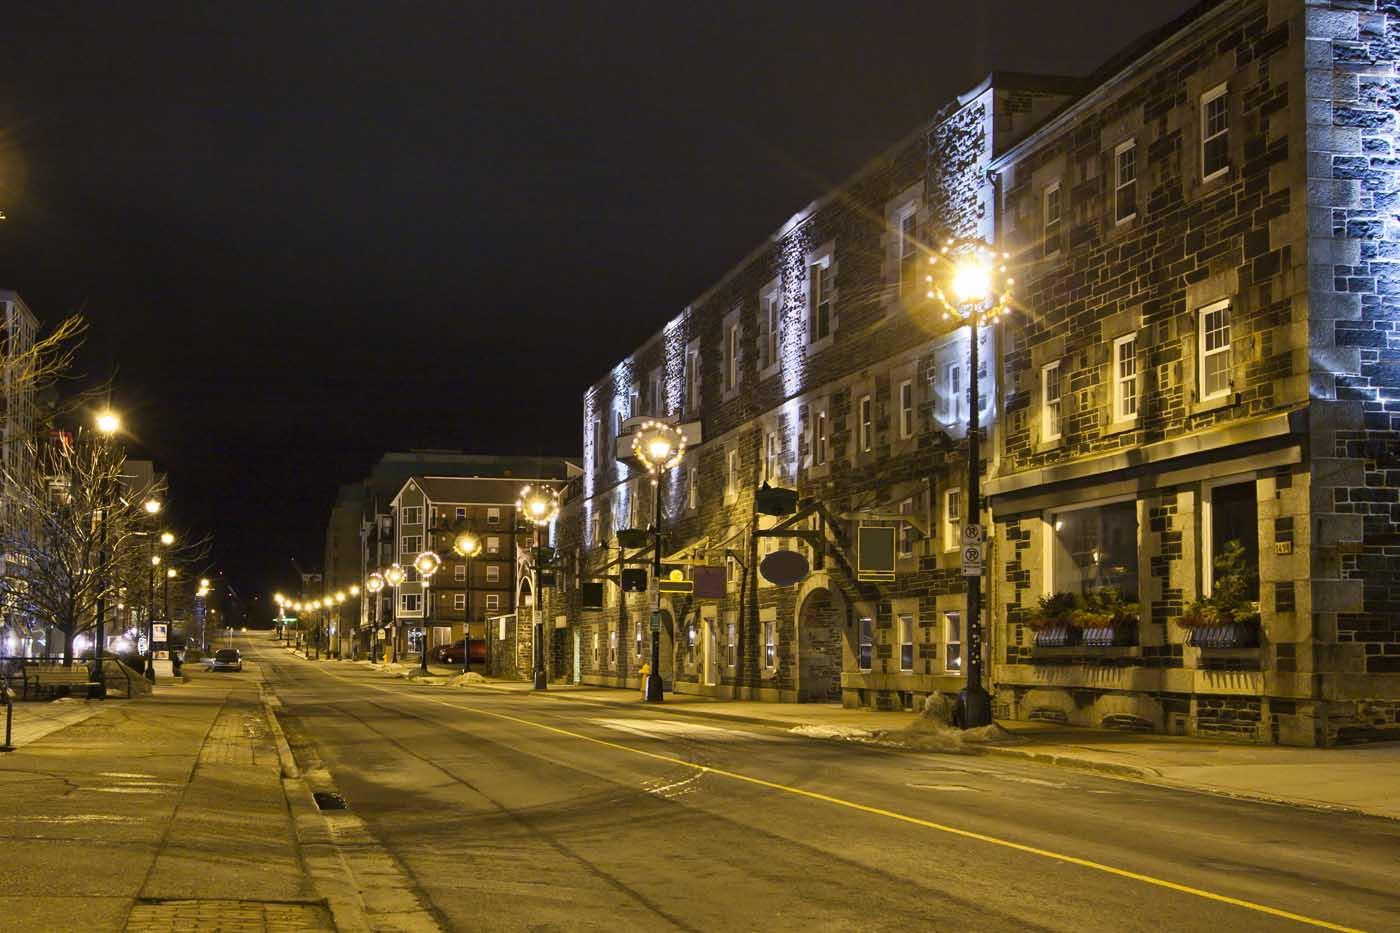 Nova Scotia Travel Costs & Prices - Cape Breton, Peggy's